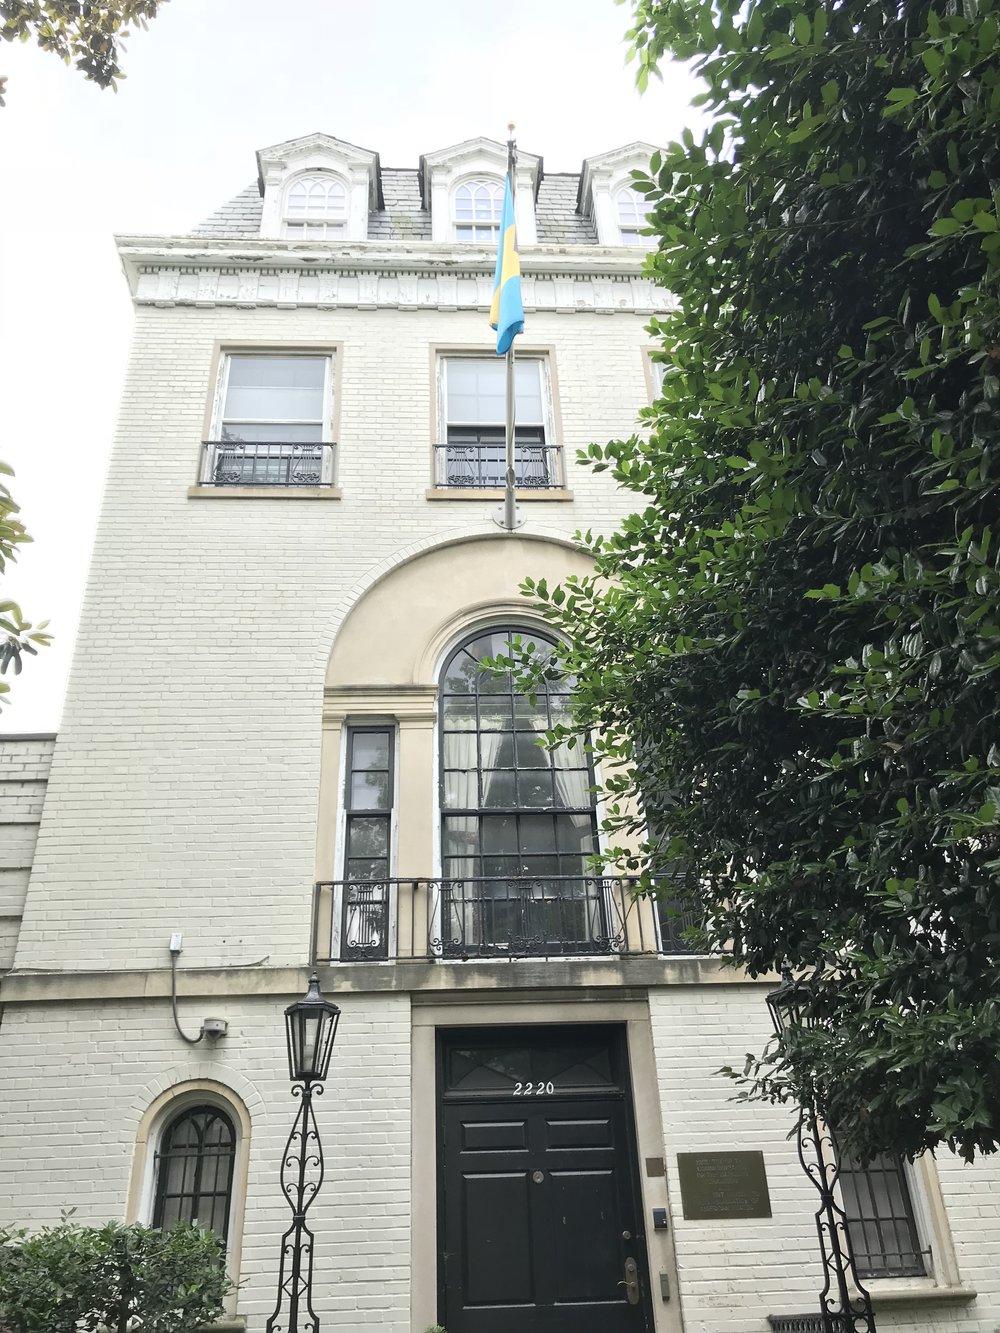 The Embassy of the Bahamas.